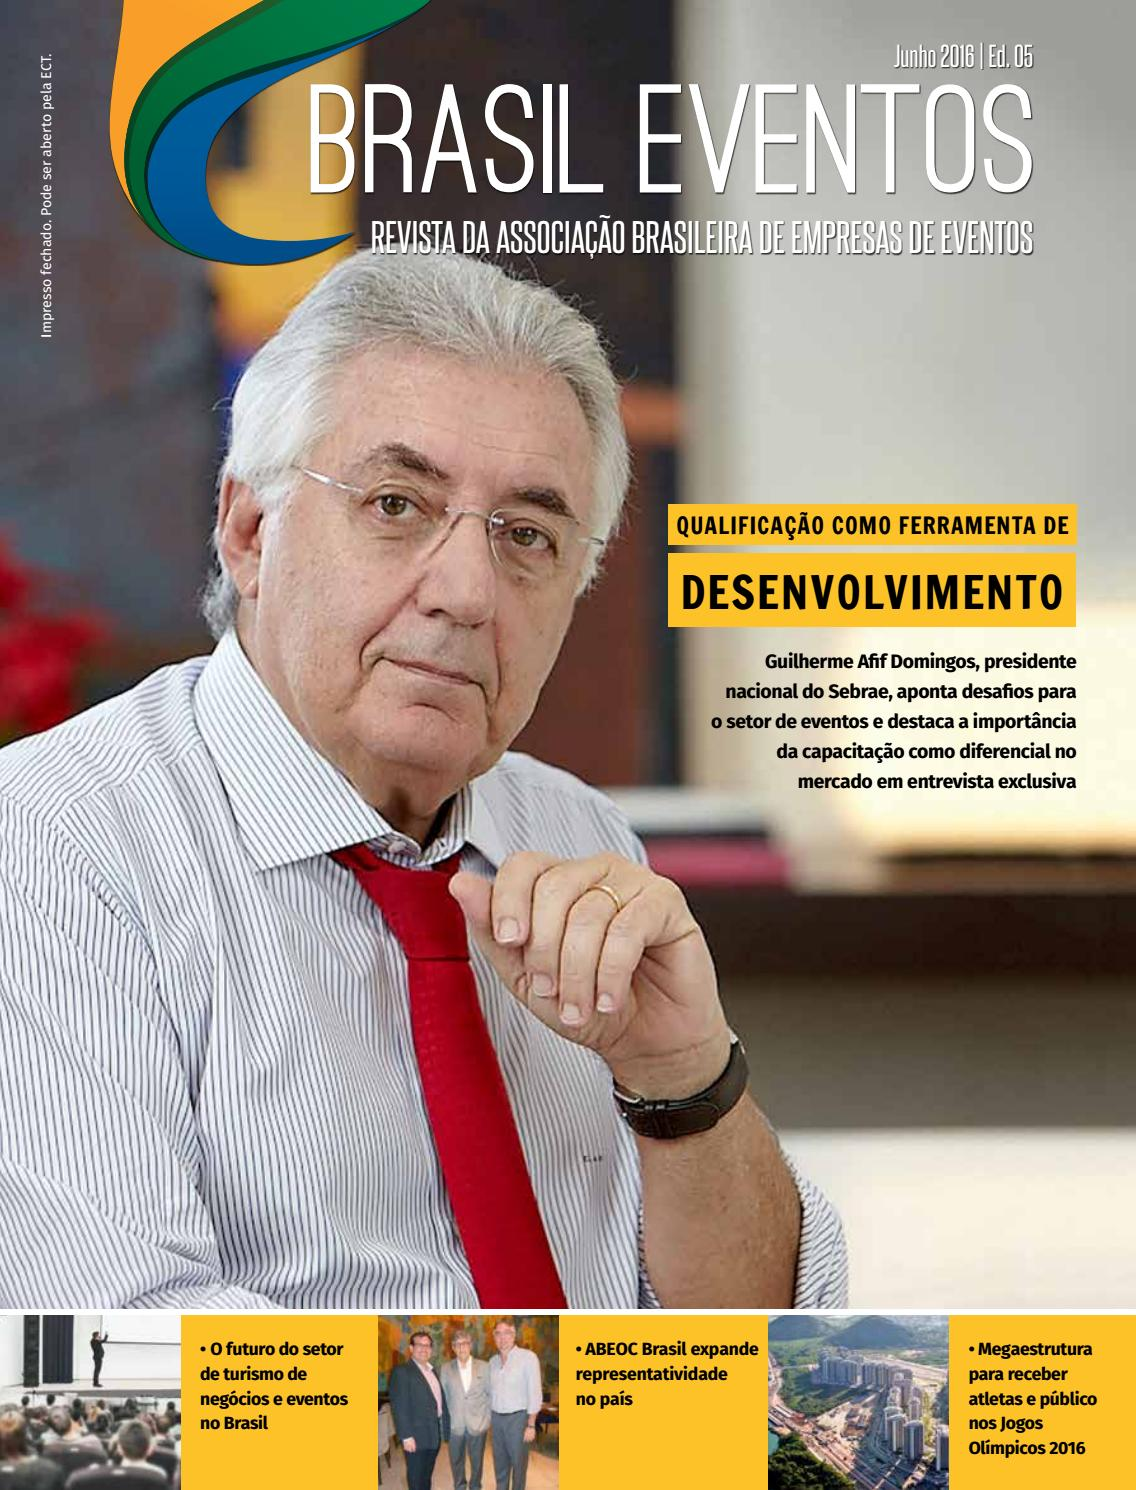 brasil-eventos-ed-05 by Abeoc Nacional - issuu